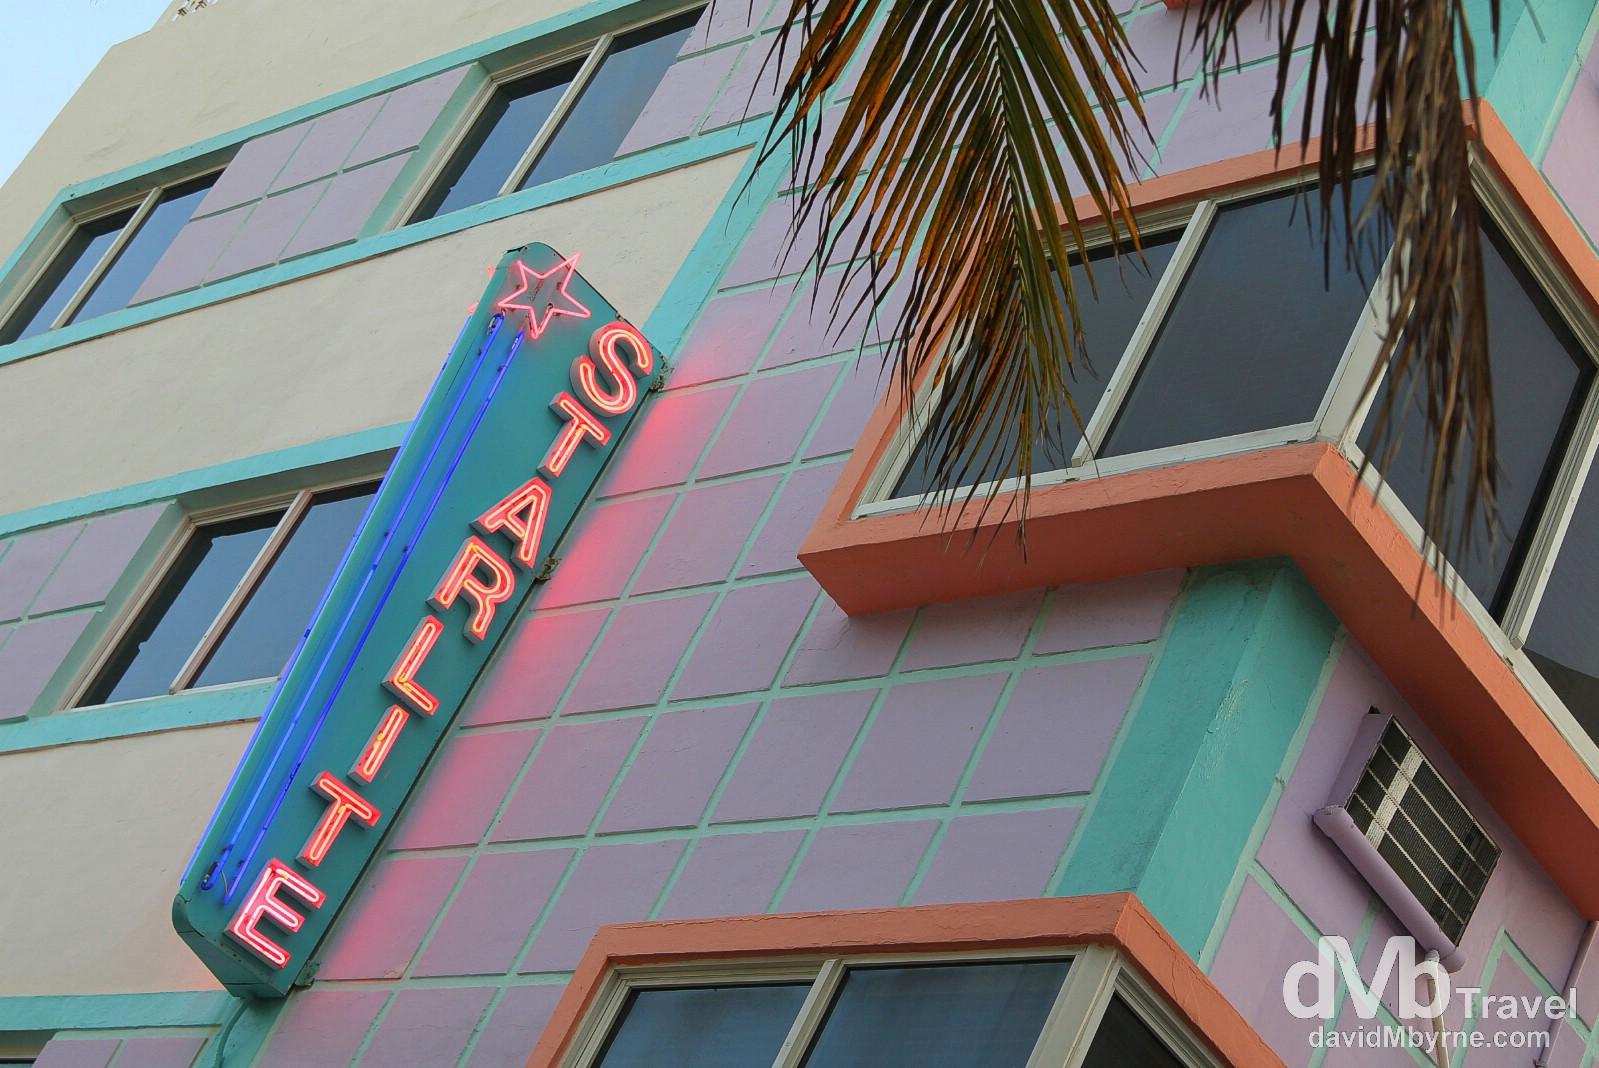 The Starlight Hotel, Ocean Drive, Miami, Florida, USA. July 8th 2013.